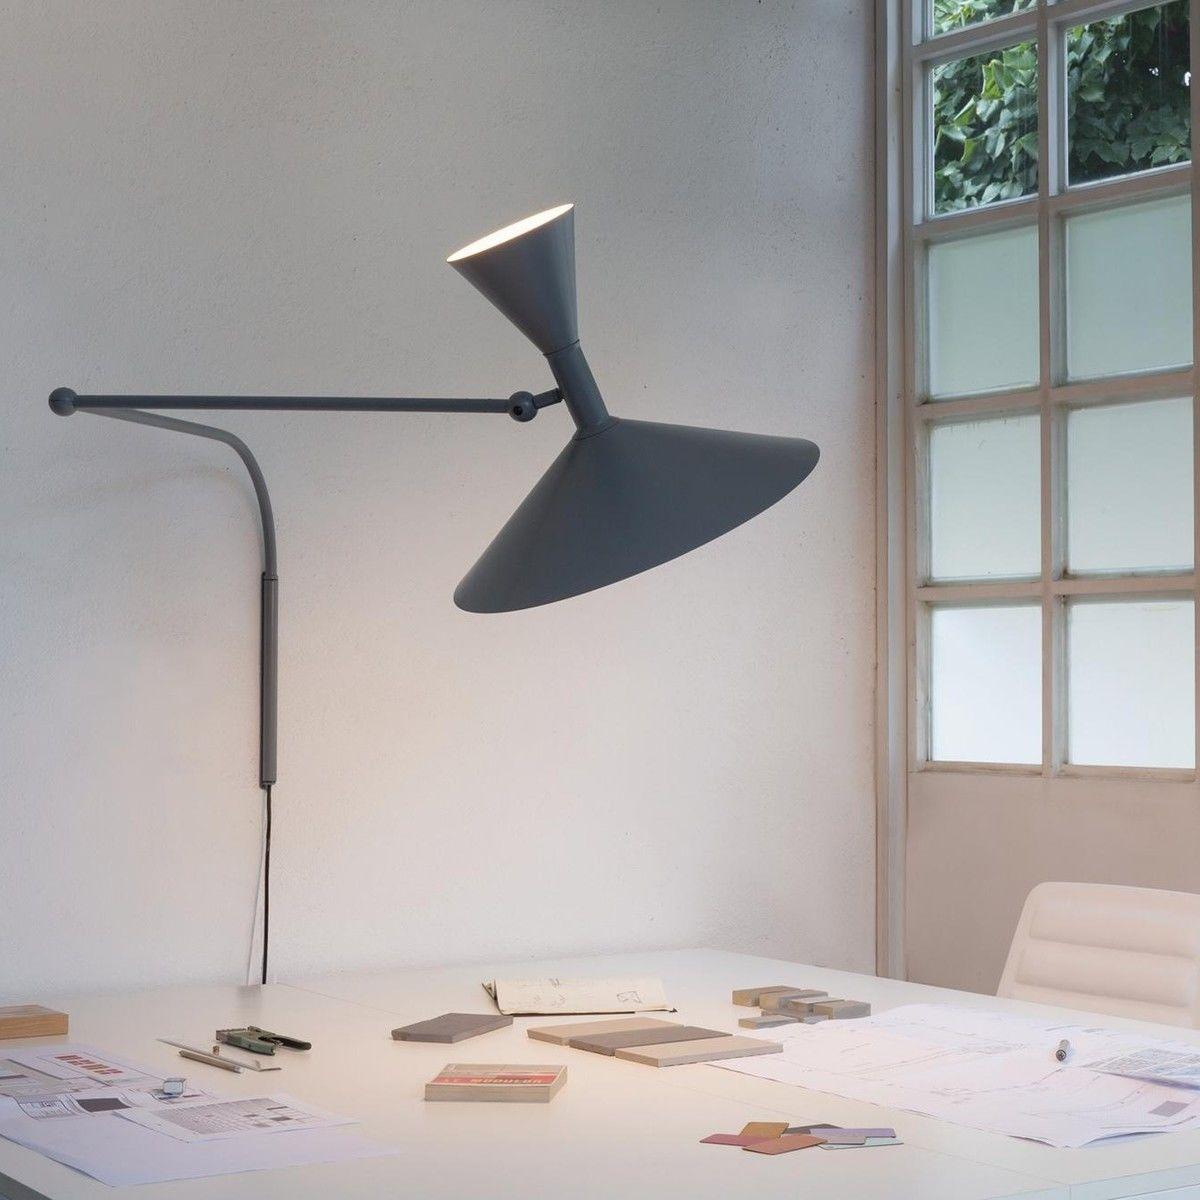 Lampe de marseille wall lamp nemo - Le corbusier lampe de marseille ...